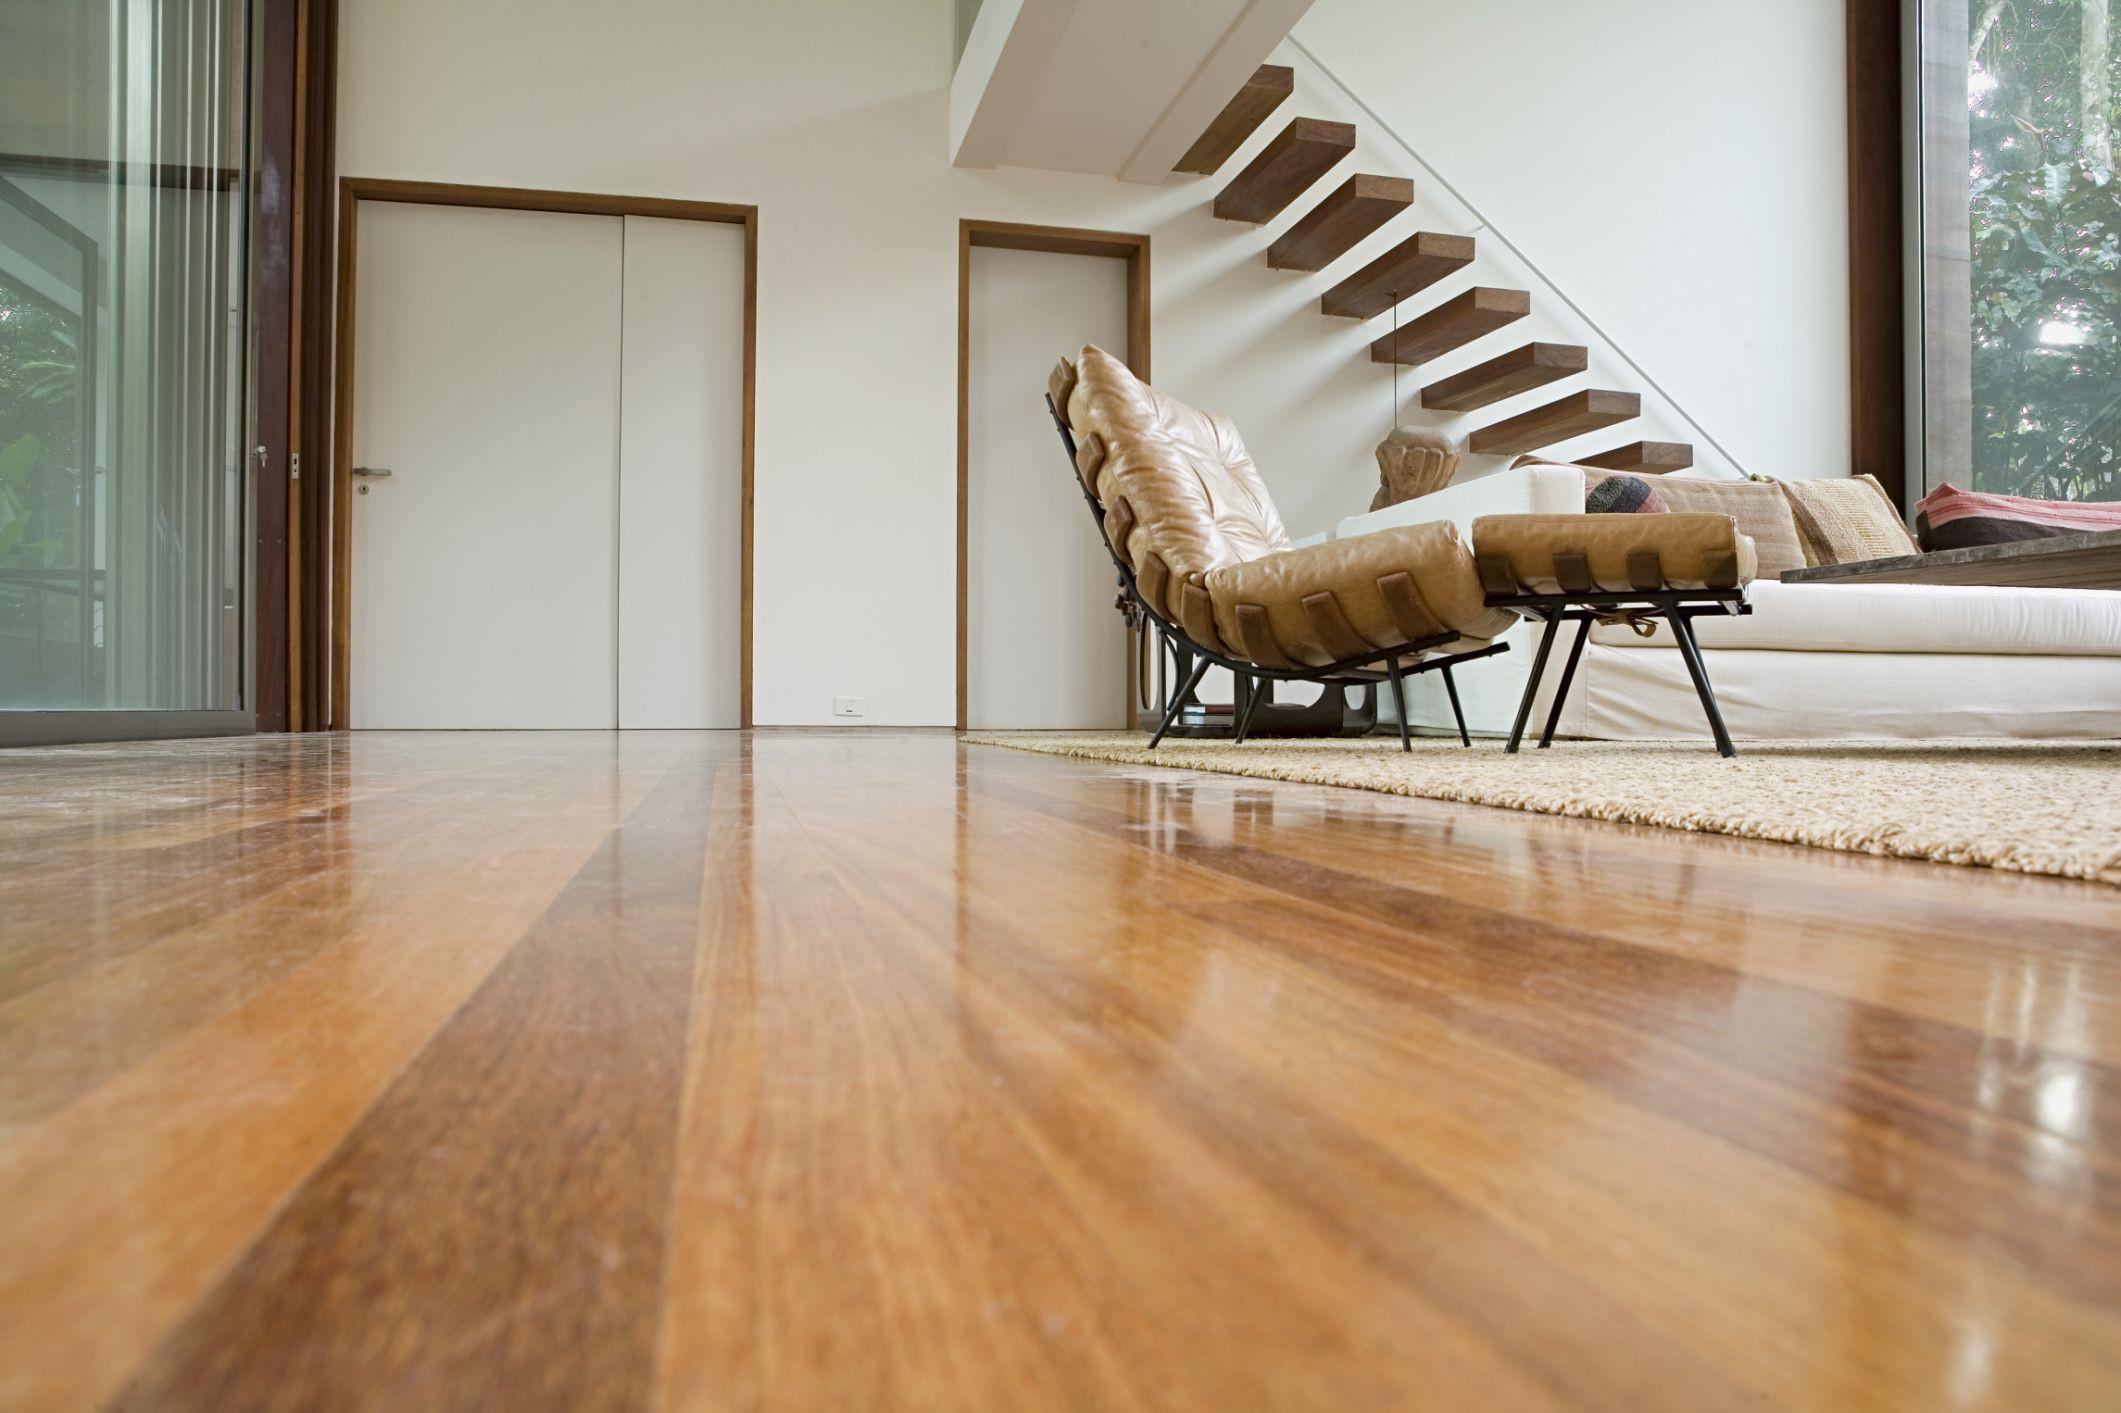 best hardwood floor finish for pets of engineered wood flooring vs solid wood flooring with 200571260 001 highres 56a49dec5f9b58b7d0d7dc1e